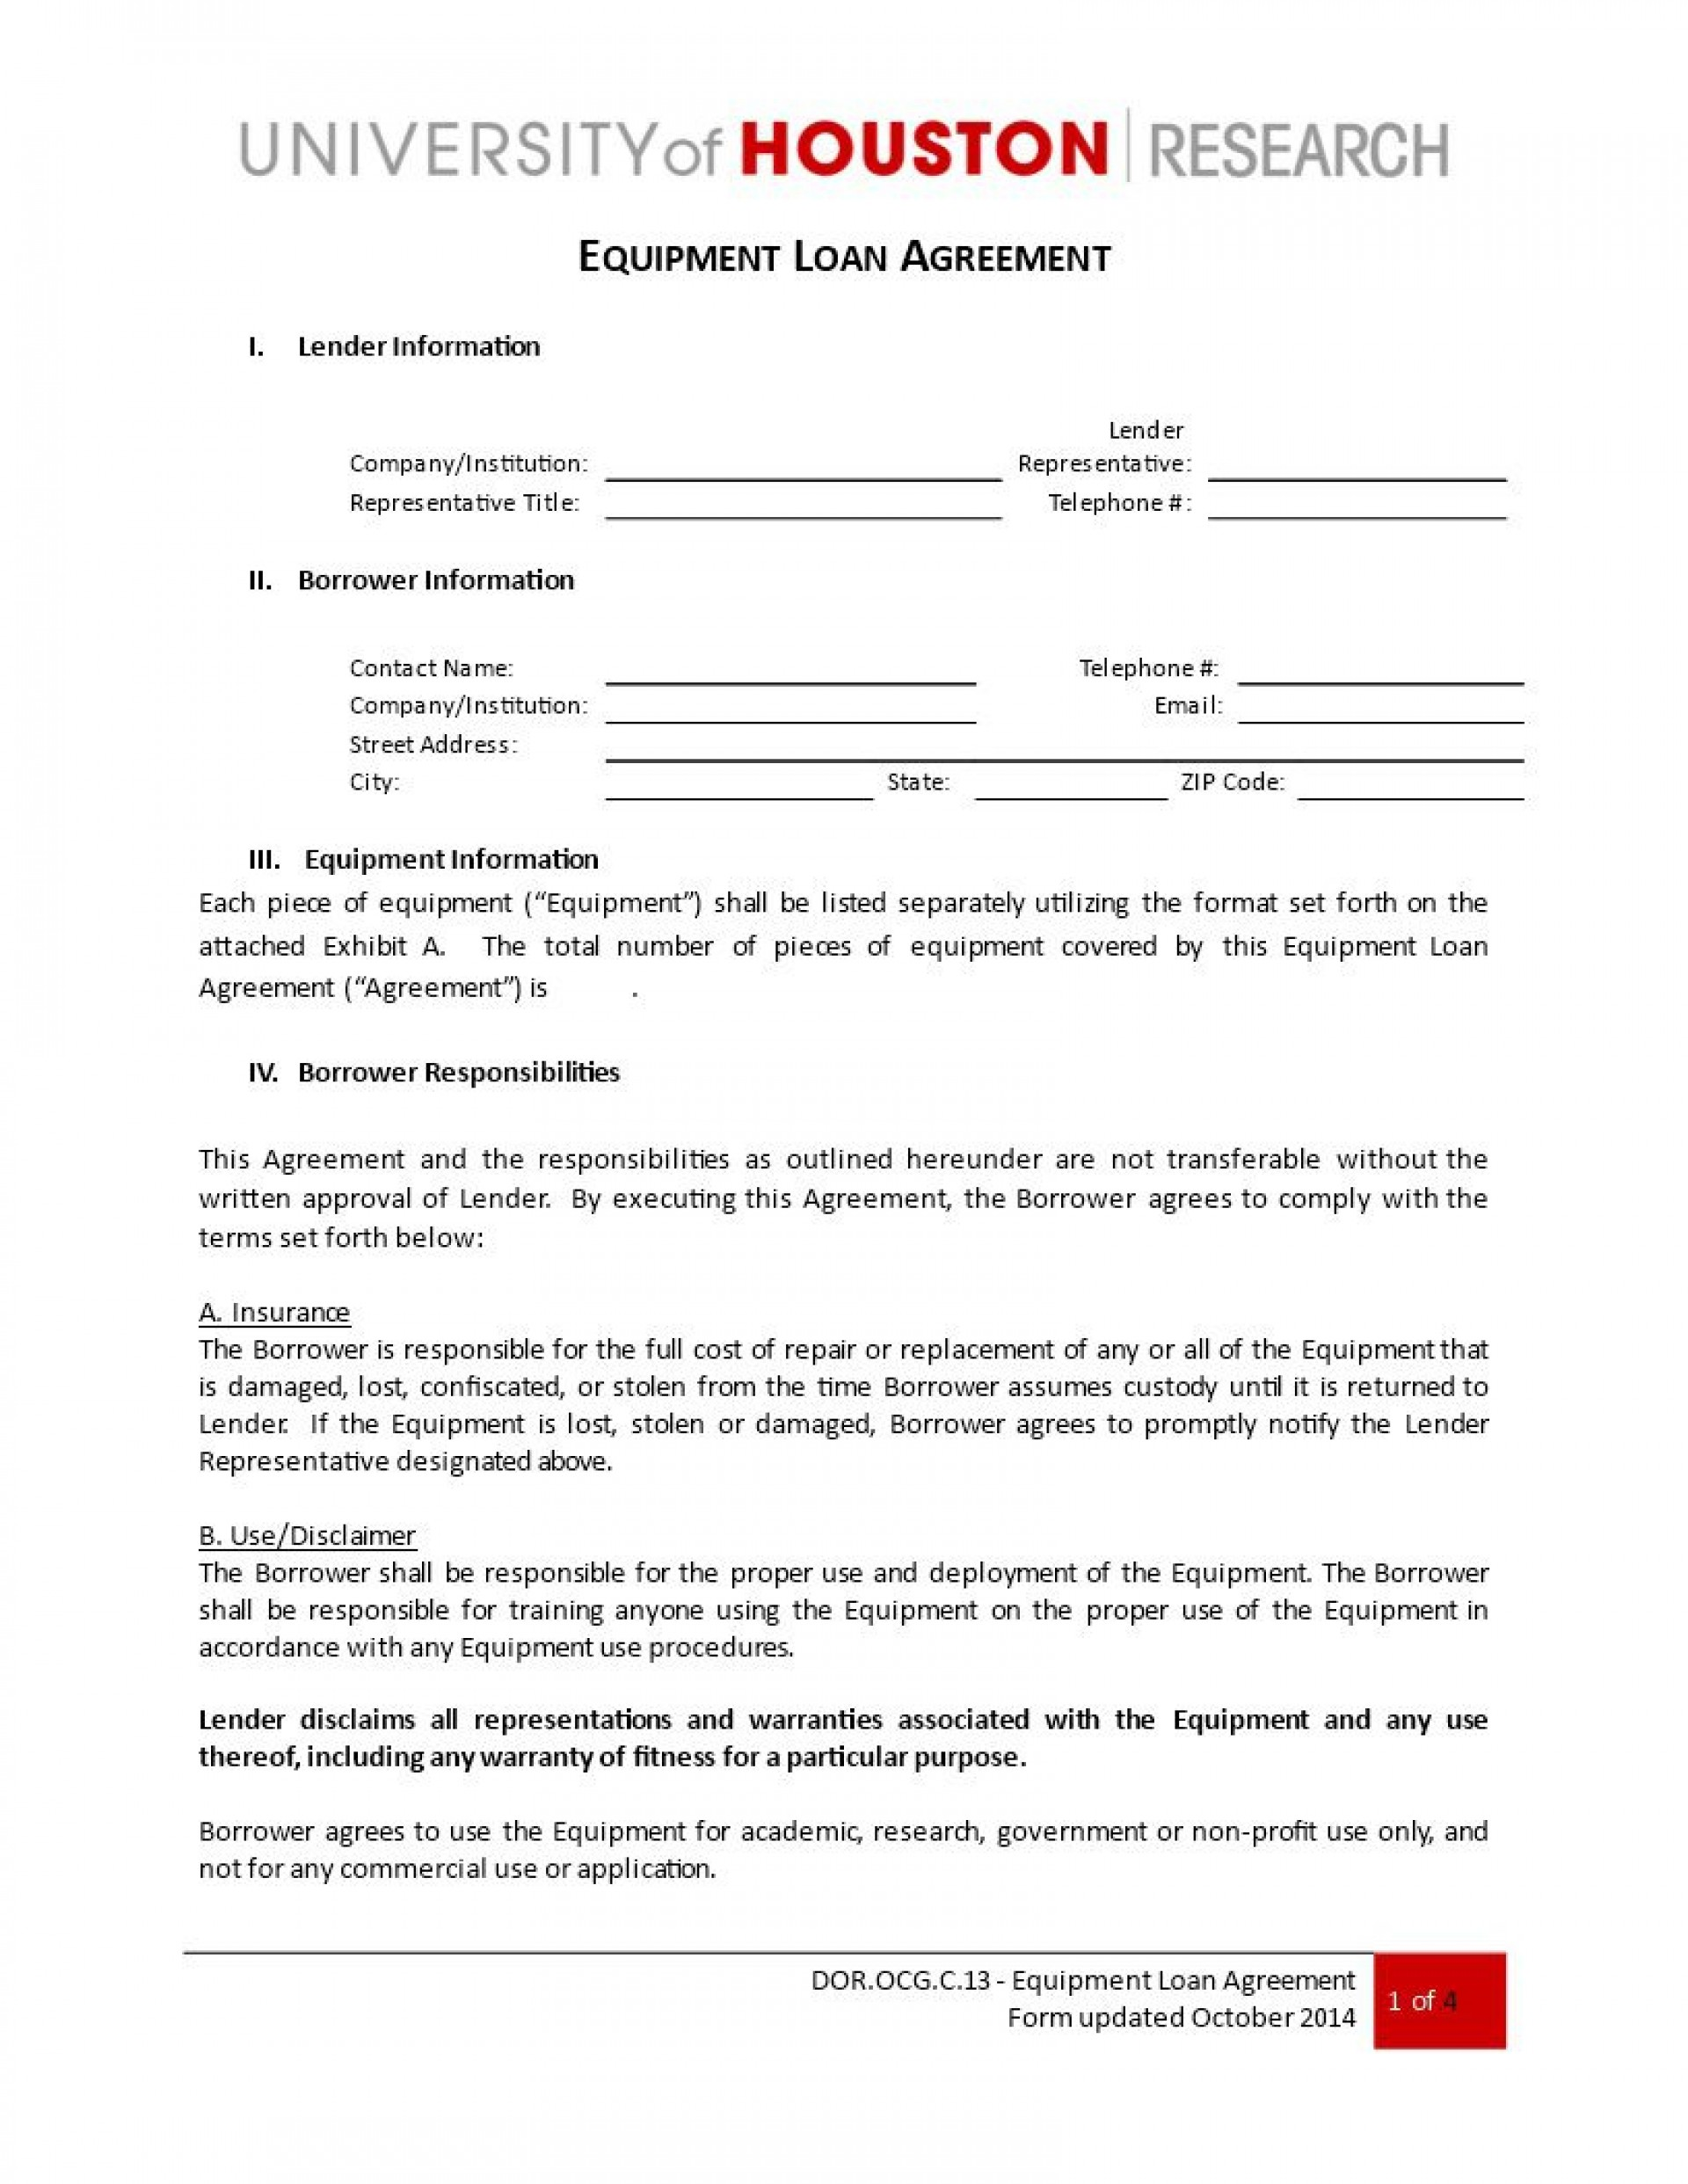 004 Phenomenal Equipment Loan Agreement Template Design  Simple Uk Borrowing Free1920